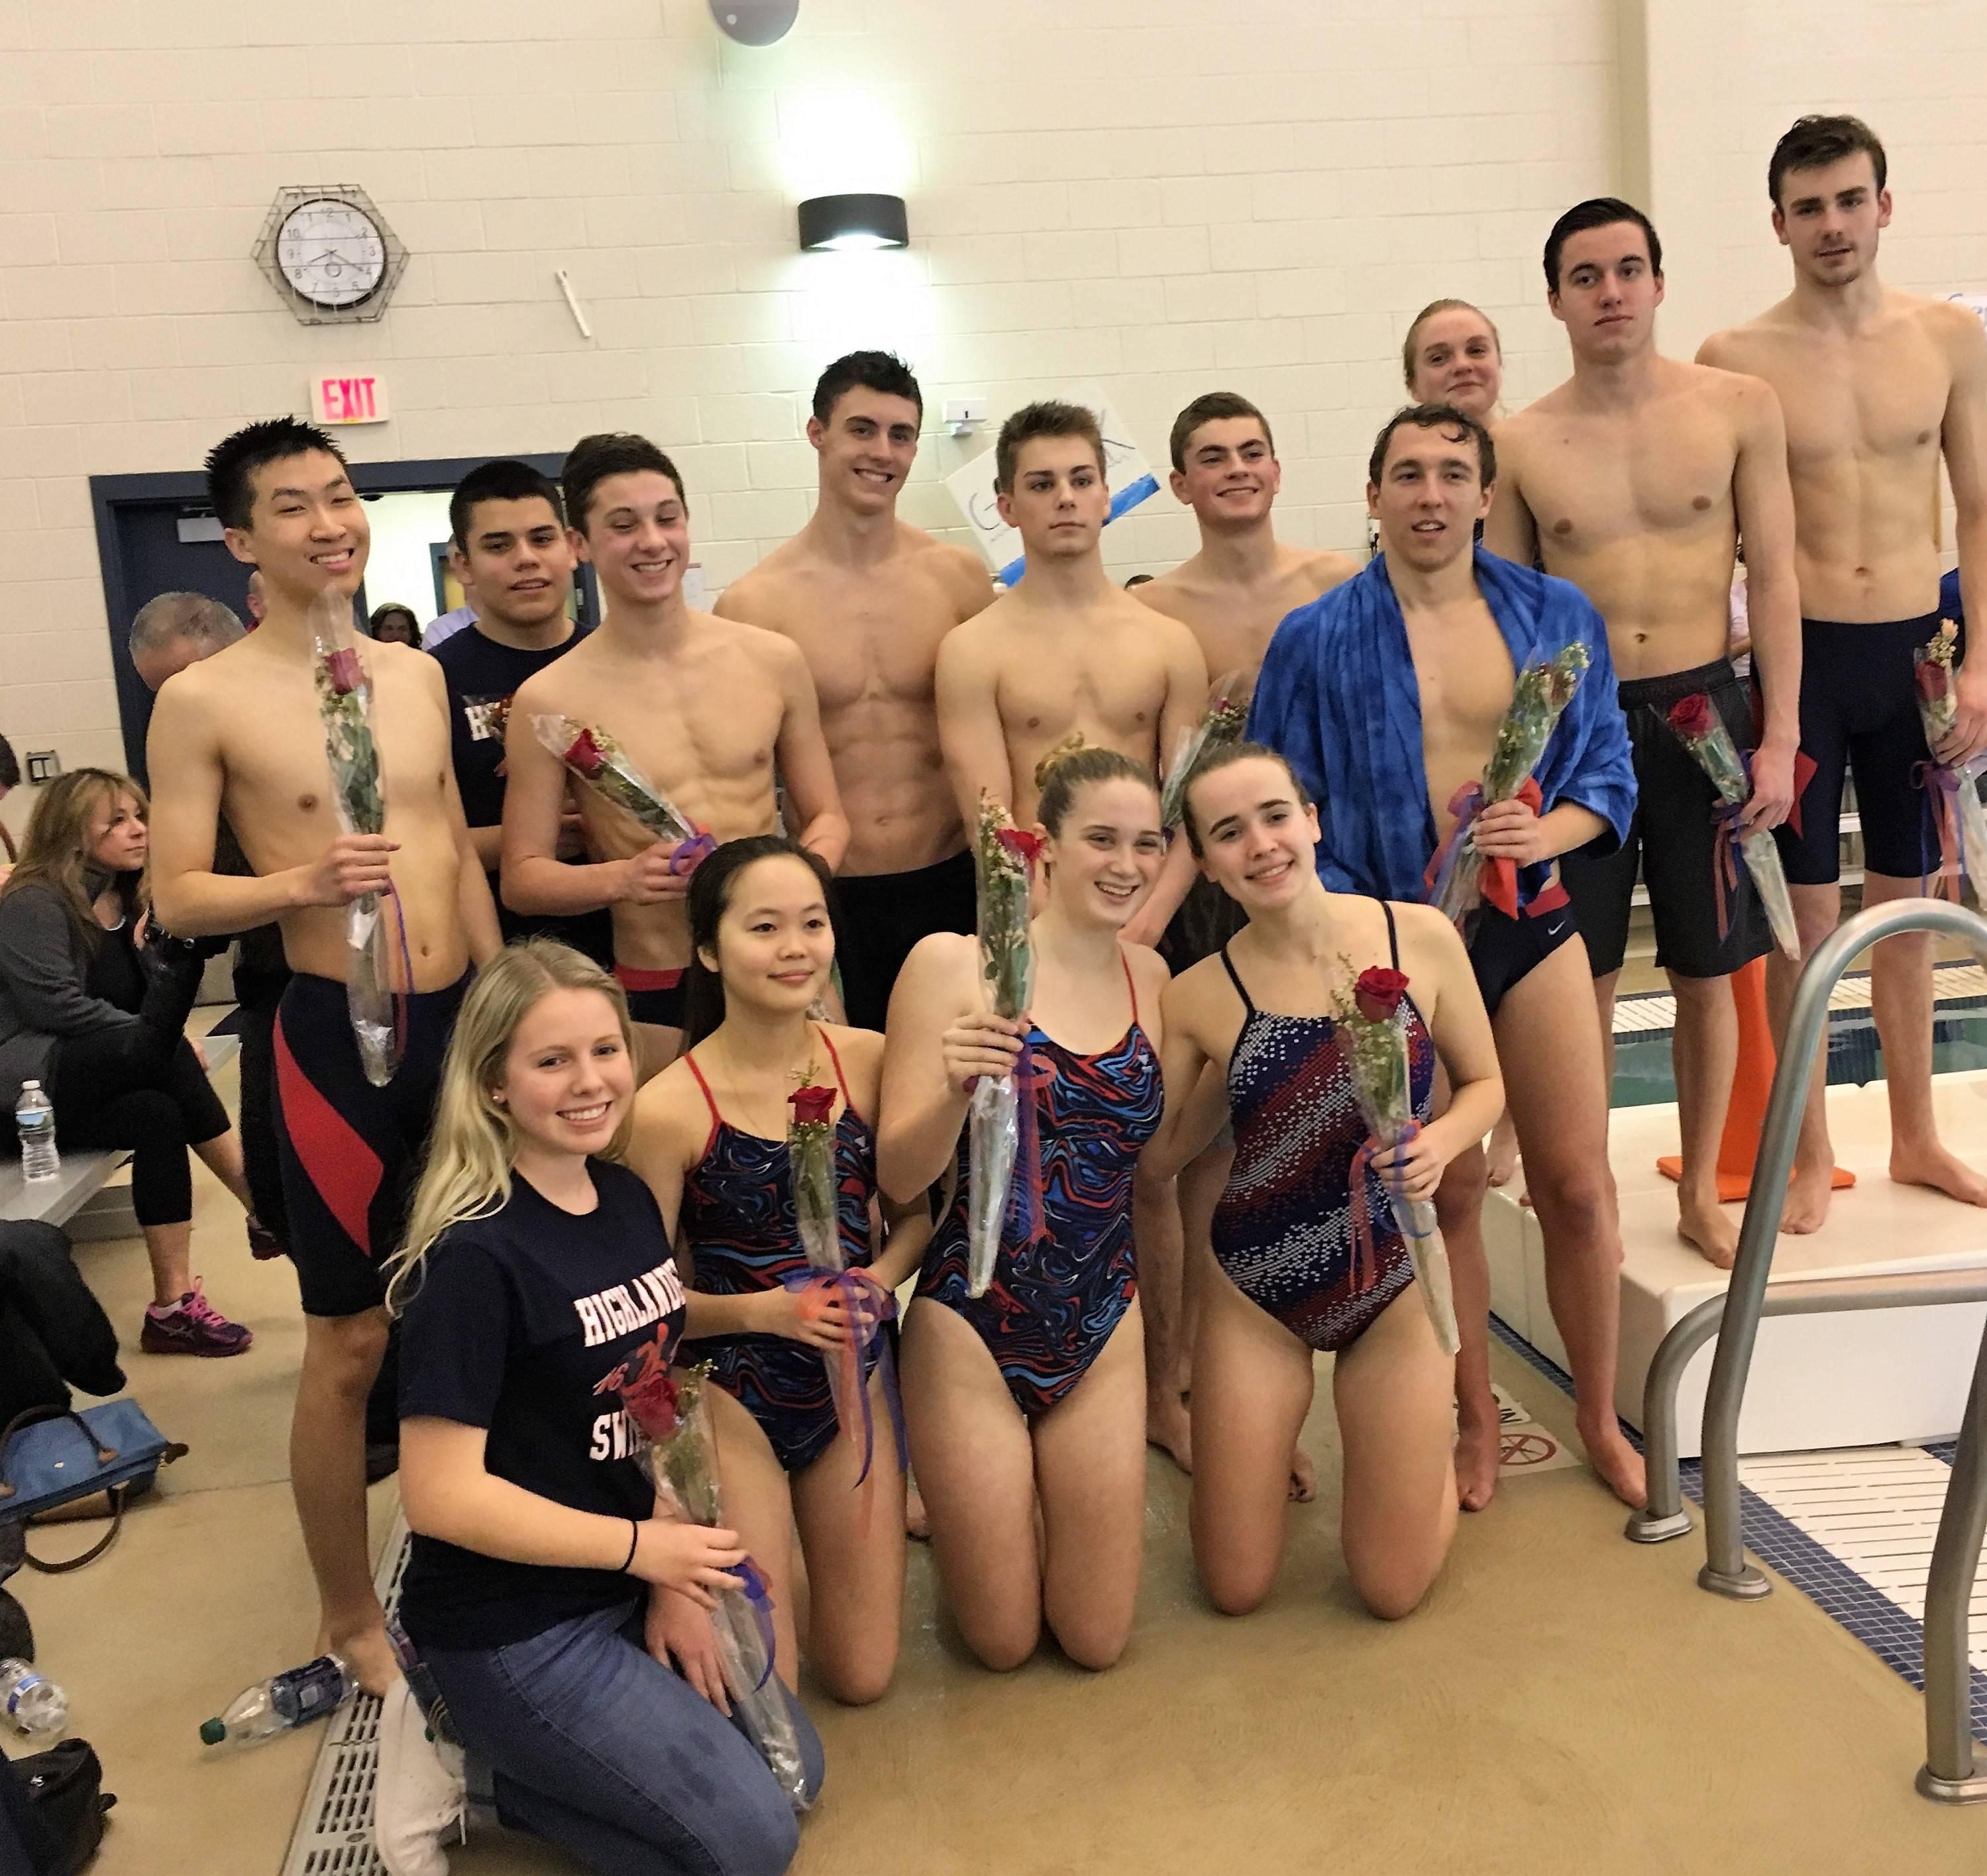 b73b3af271622cc5abfb_swim_team.jpg